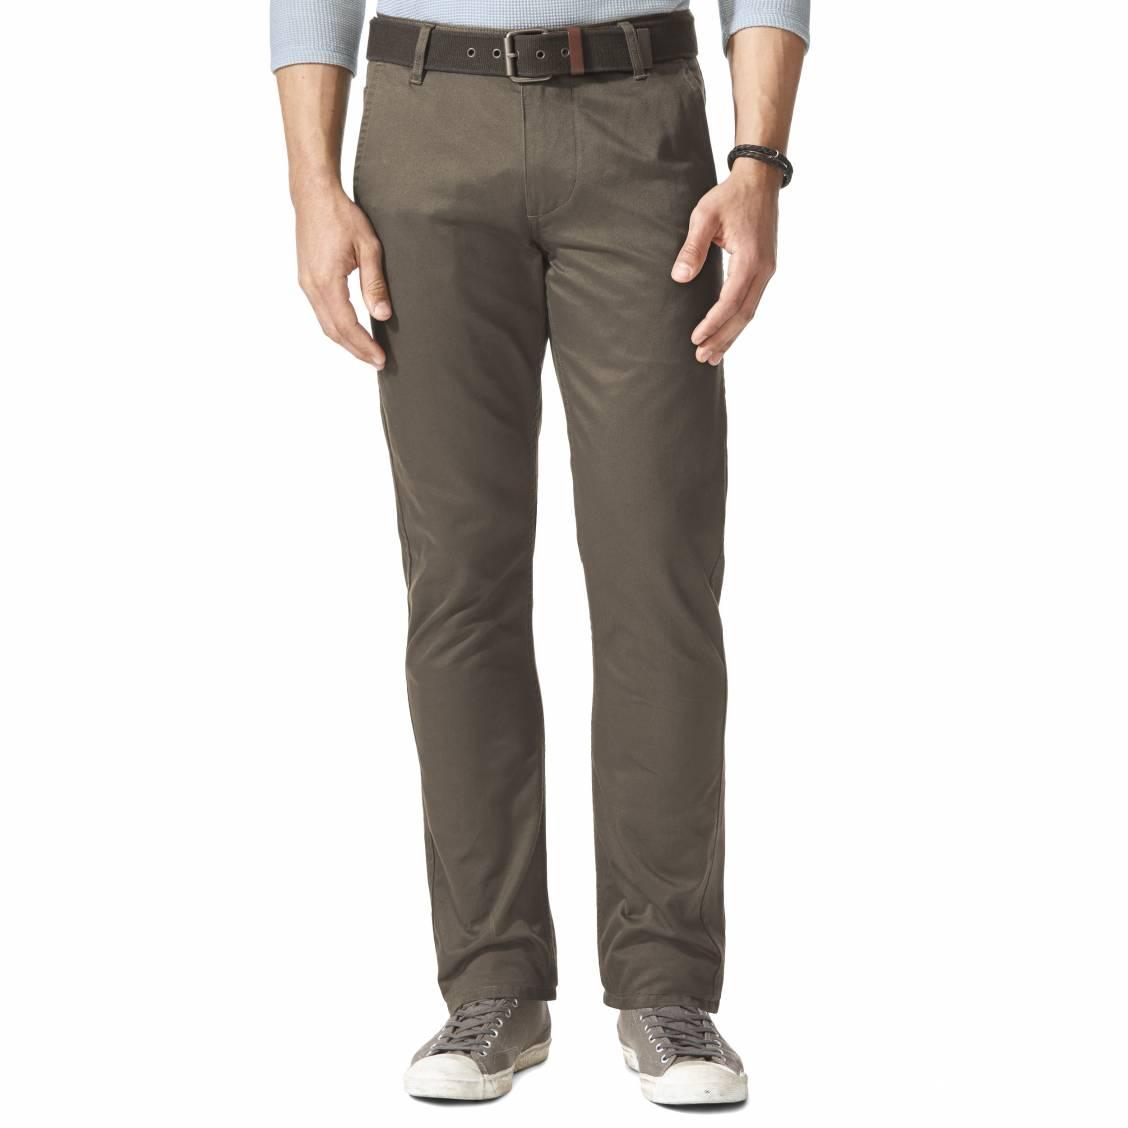 Pantalon alpha khaki original slim tapered  en twill taupe